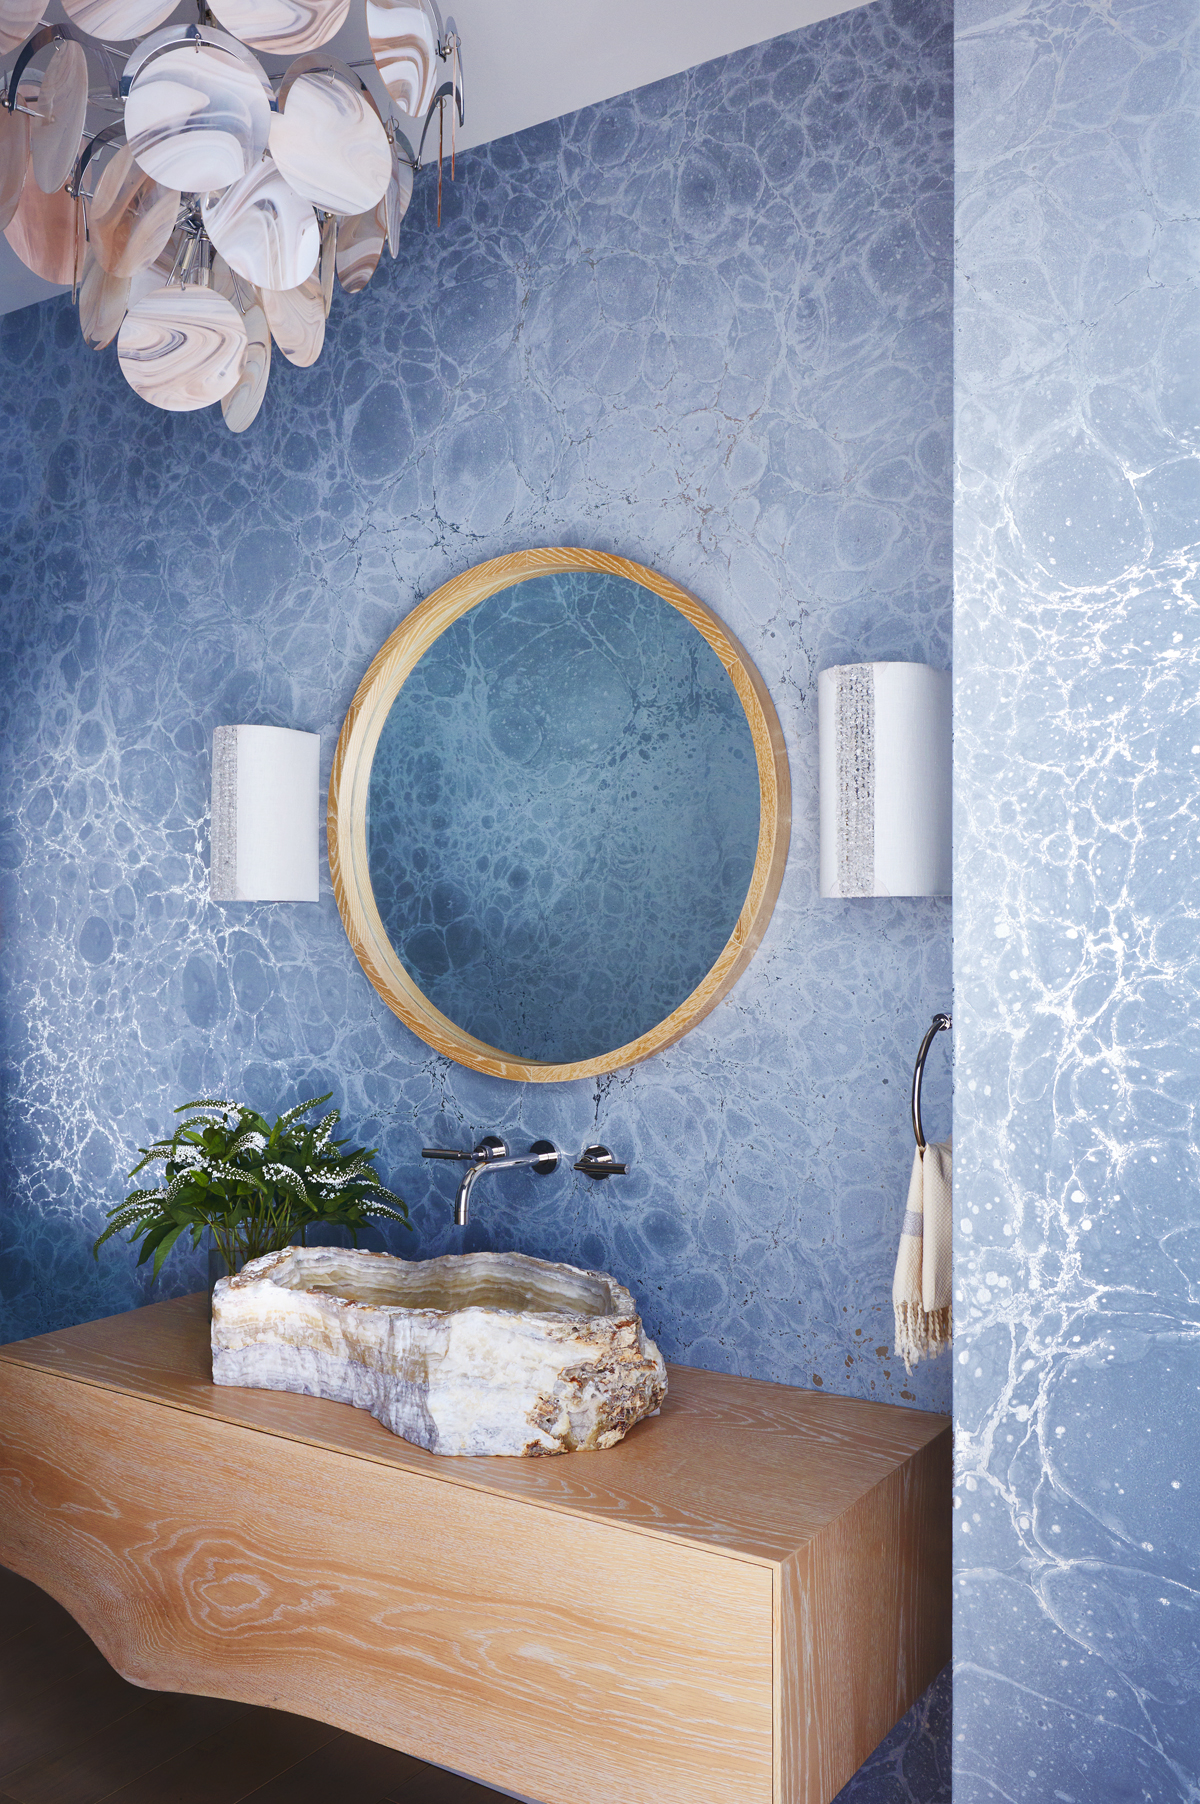 Amy Lau Calico wallpaper lumaris powder room